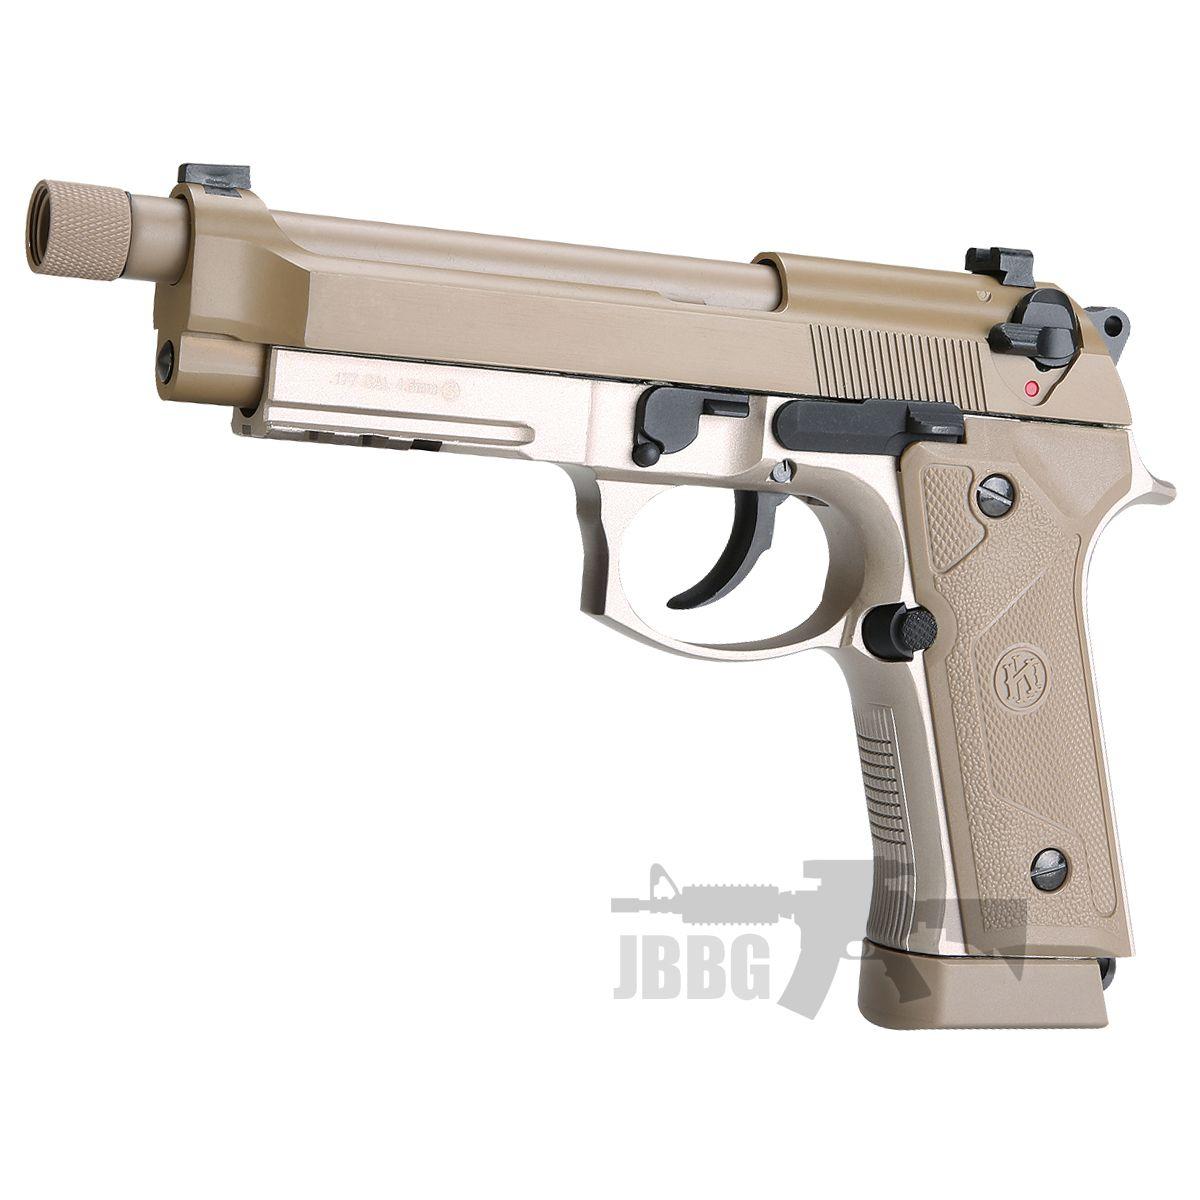 KL M92 TD Co2 Blowback Air Pistol with Threaded Barrel